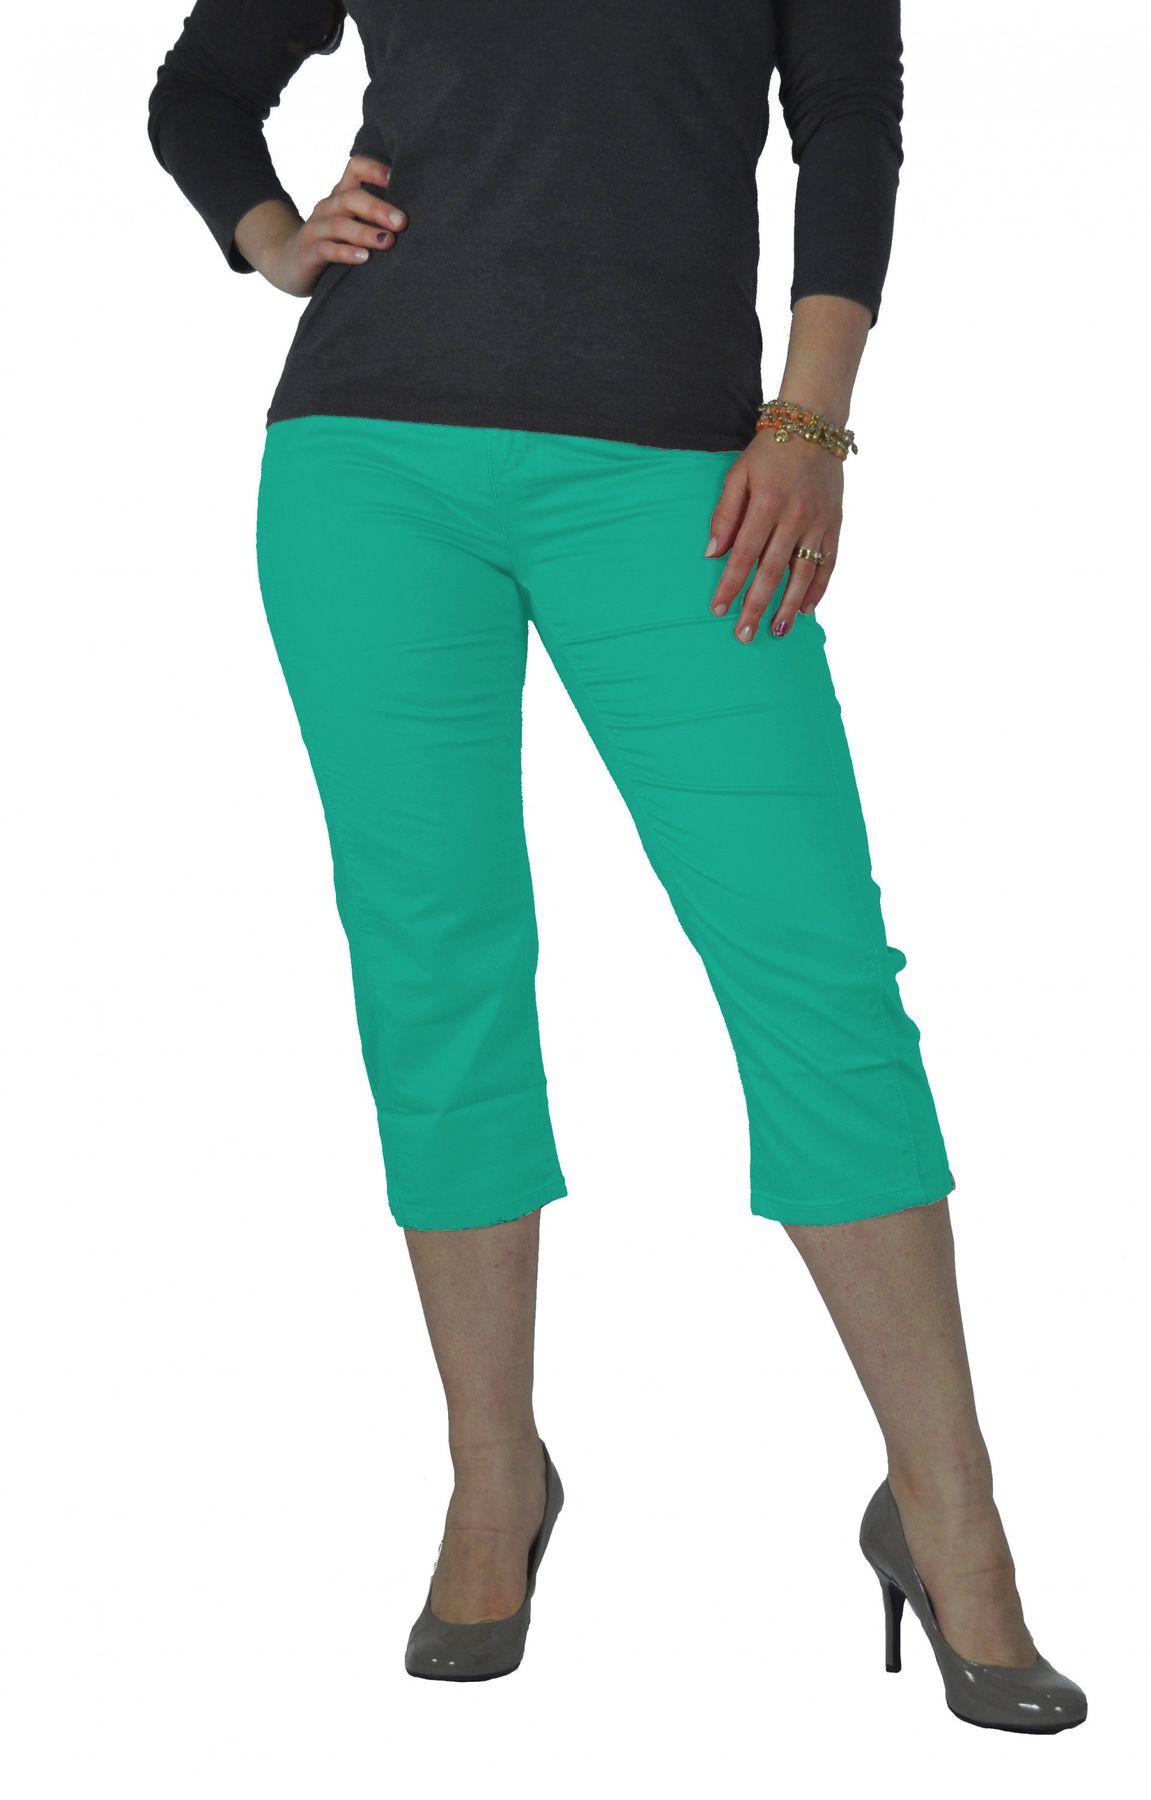 Stooker - Damen 3/4 Capri Stretch Hose in verschiedenen Farben, Tahiti (0482) – Bild 2